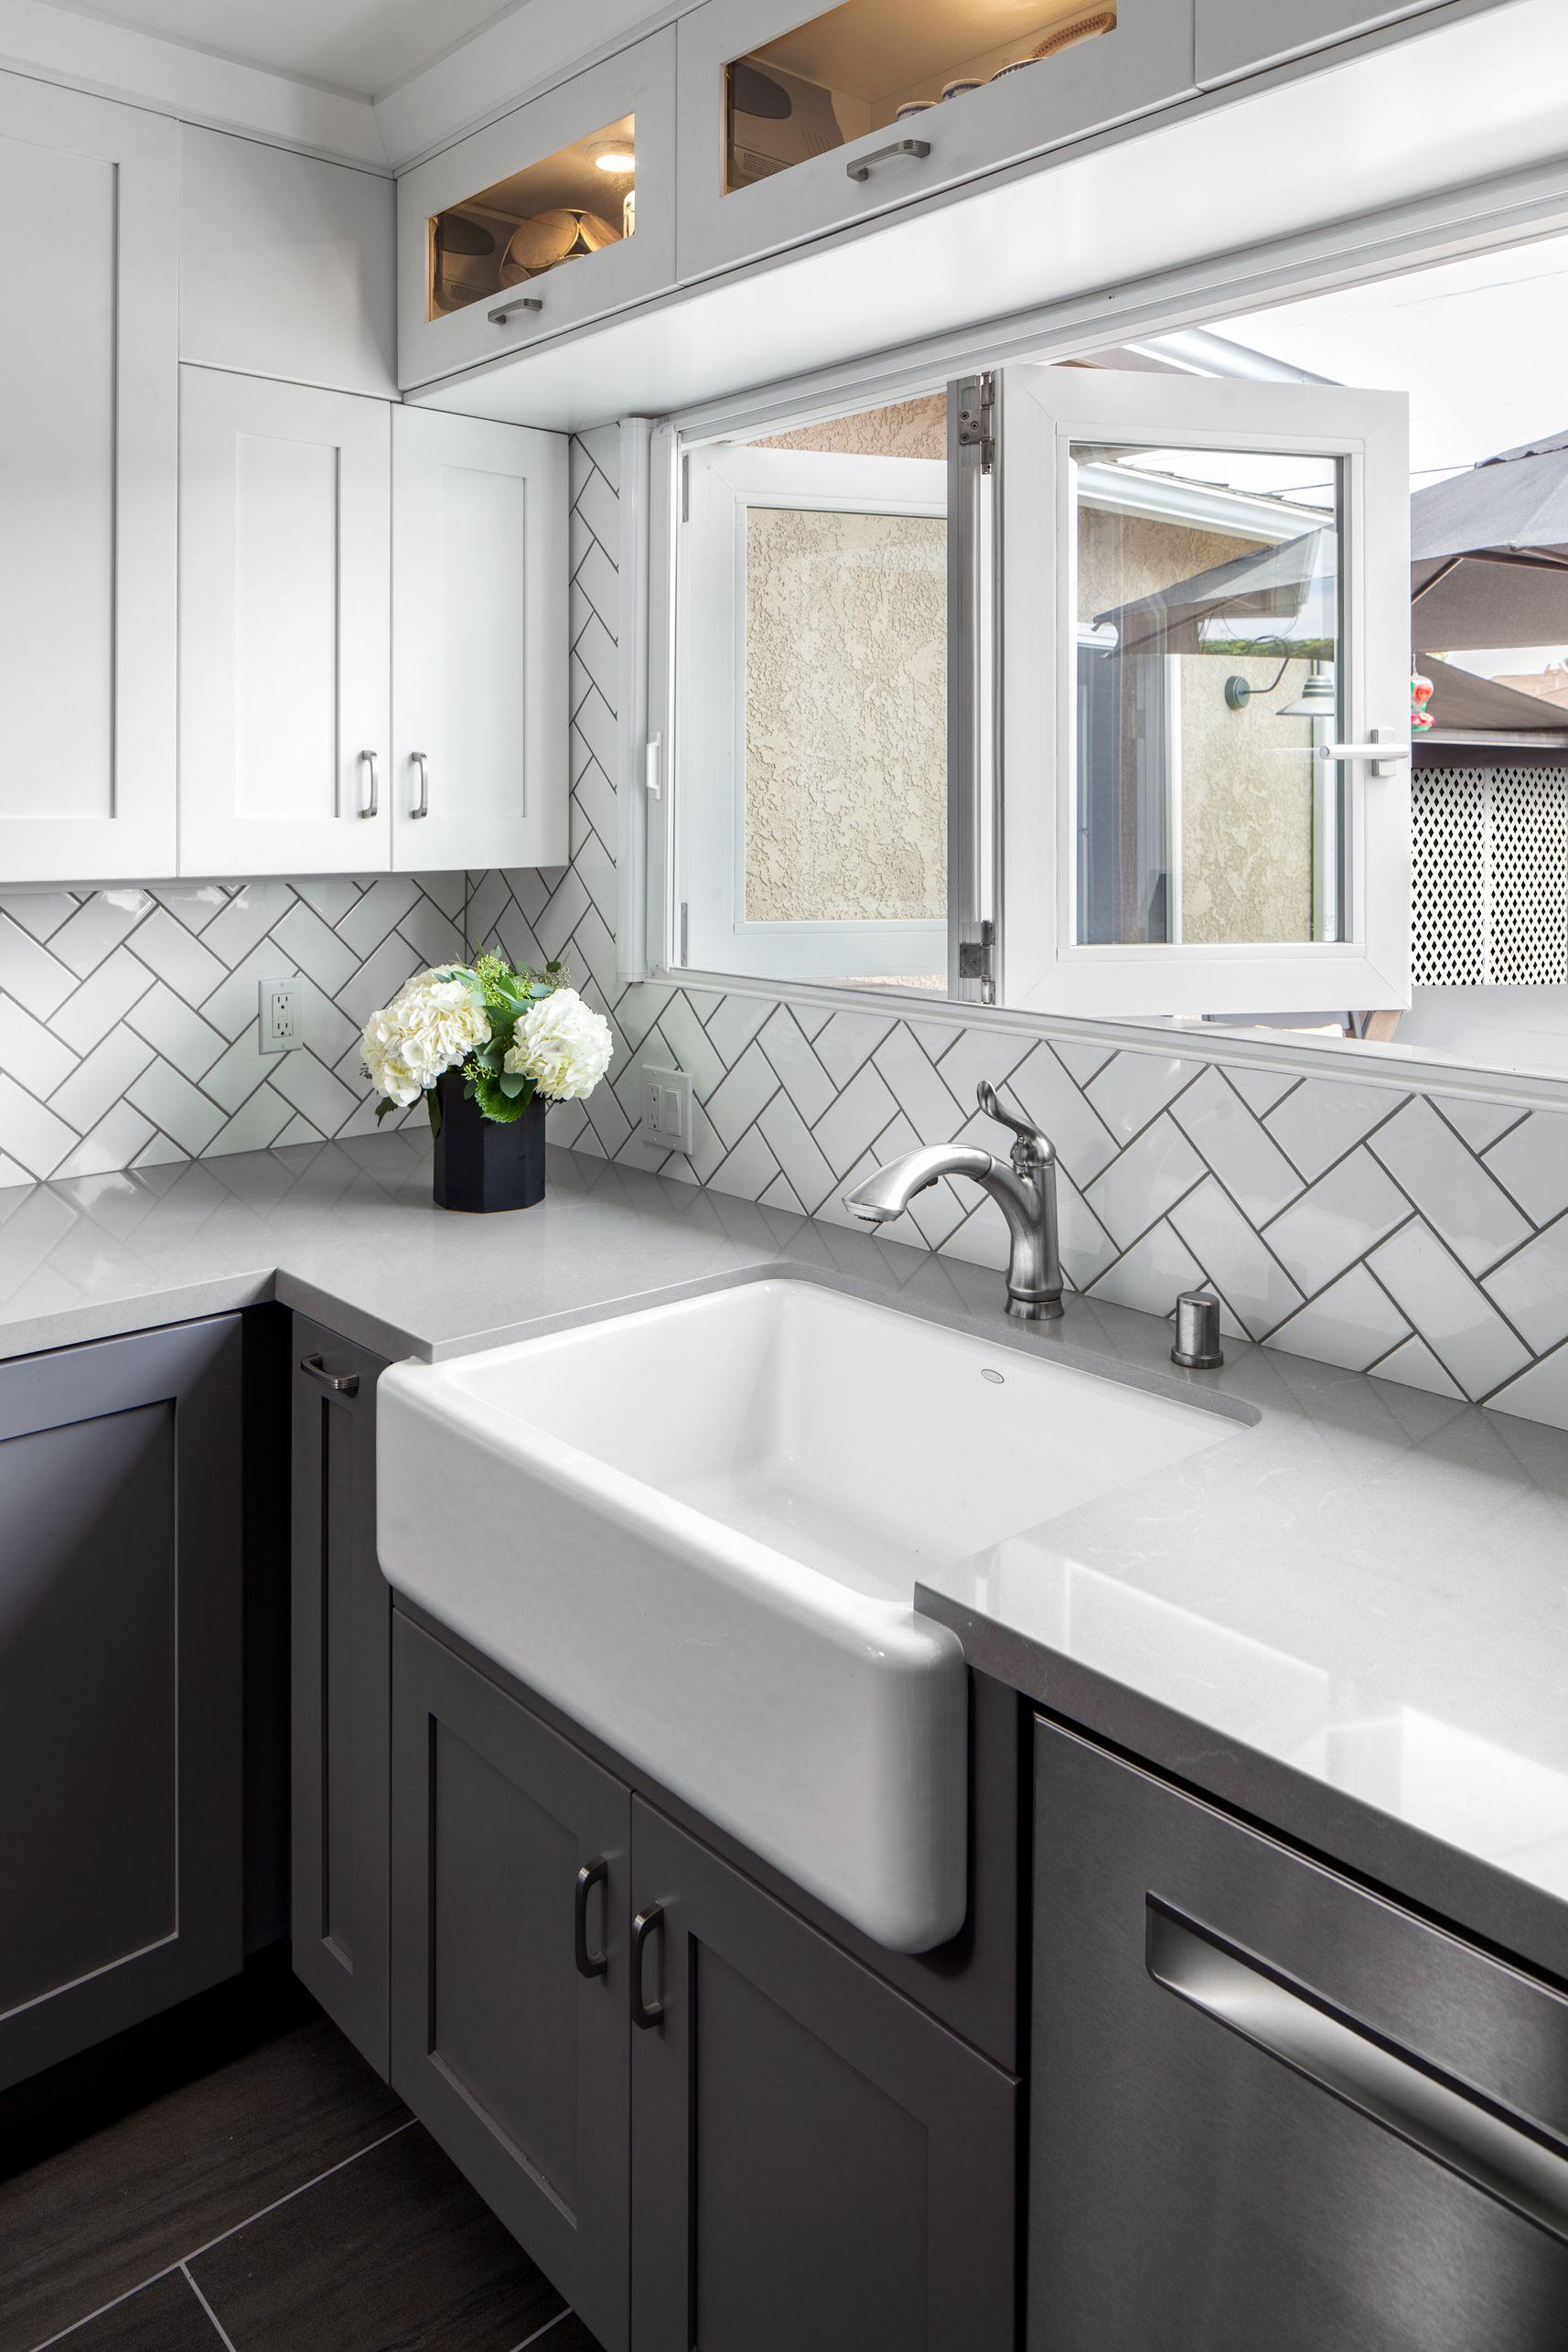 Download Wallpaper White Kitchen Gray Subway Tile Backsplash